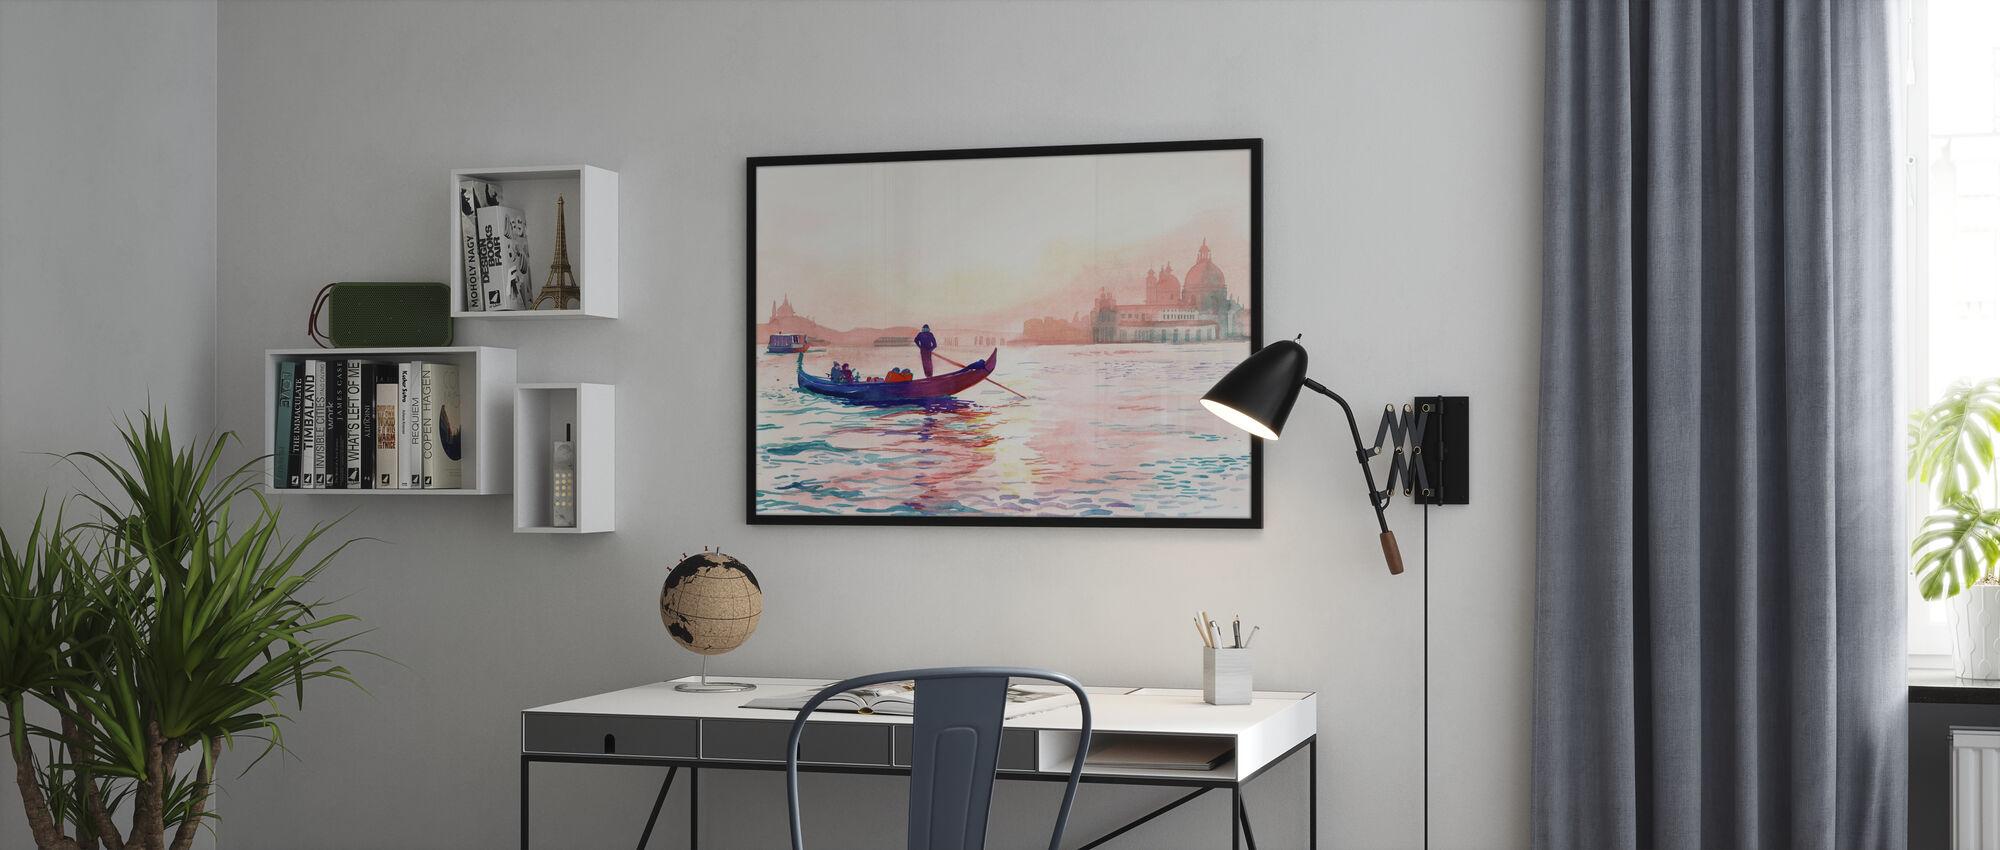 Grand Hotel Venice - Poster - Büro